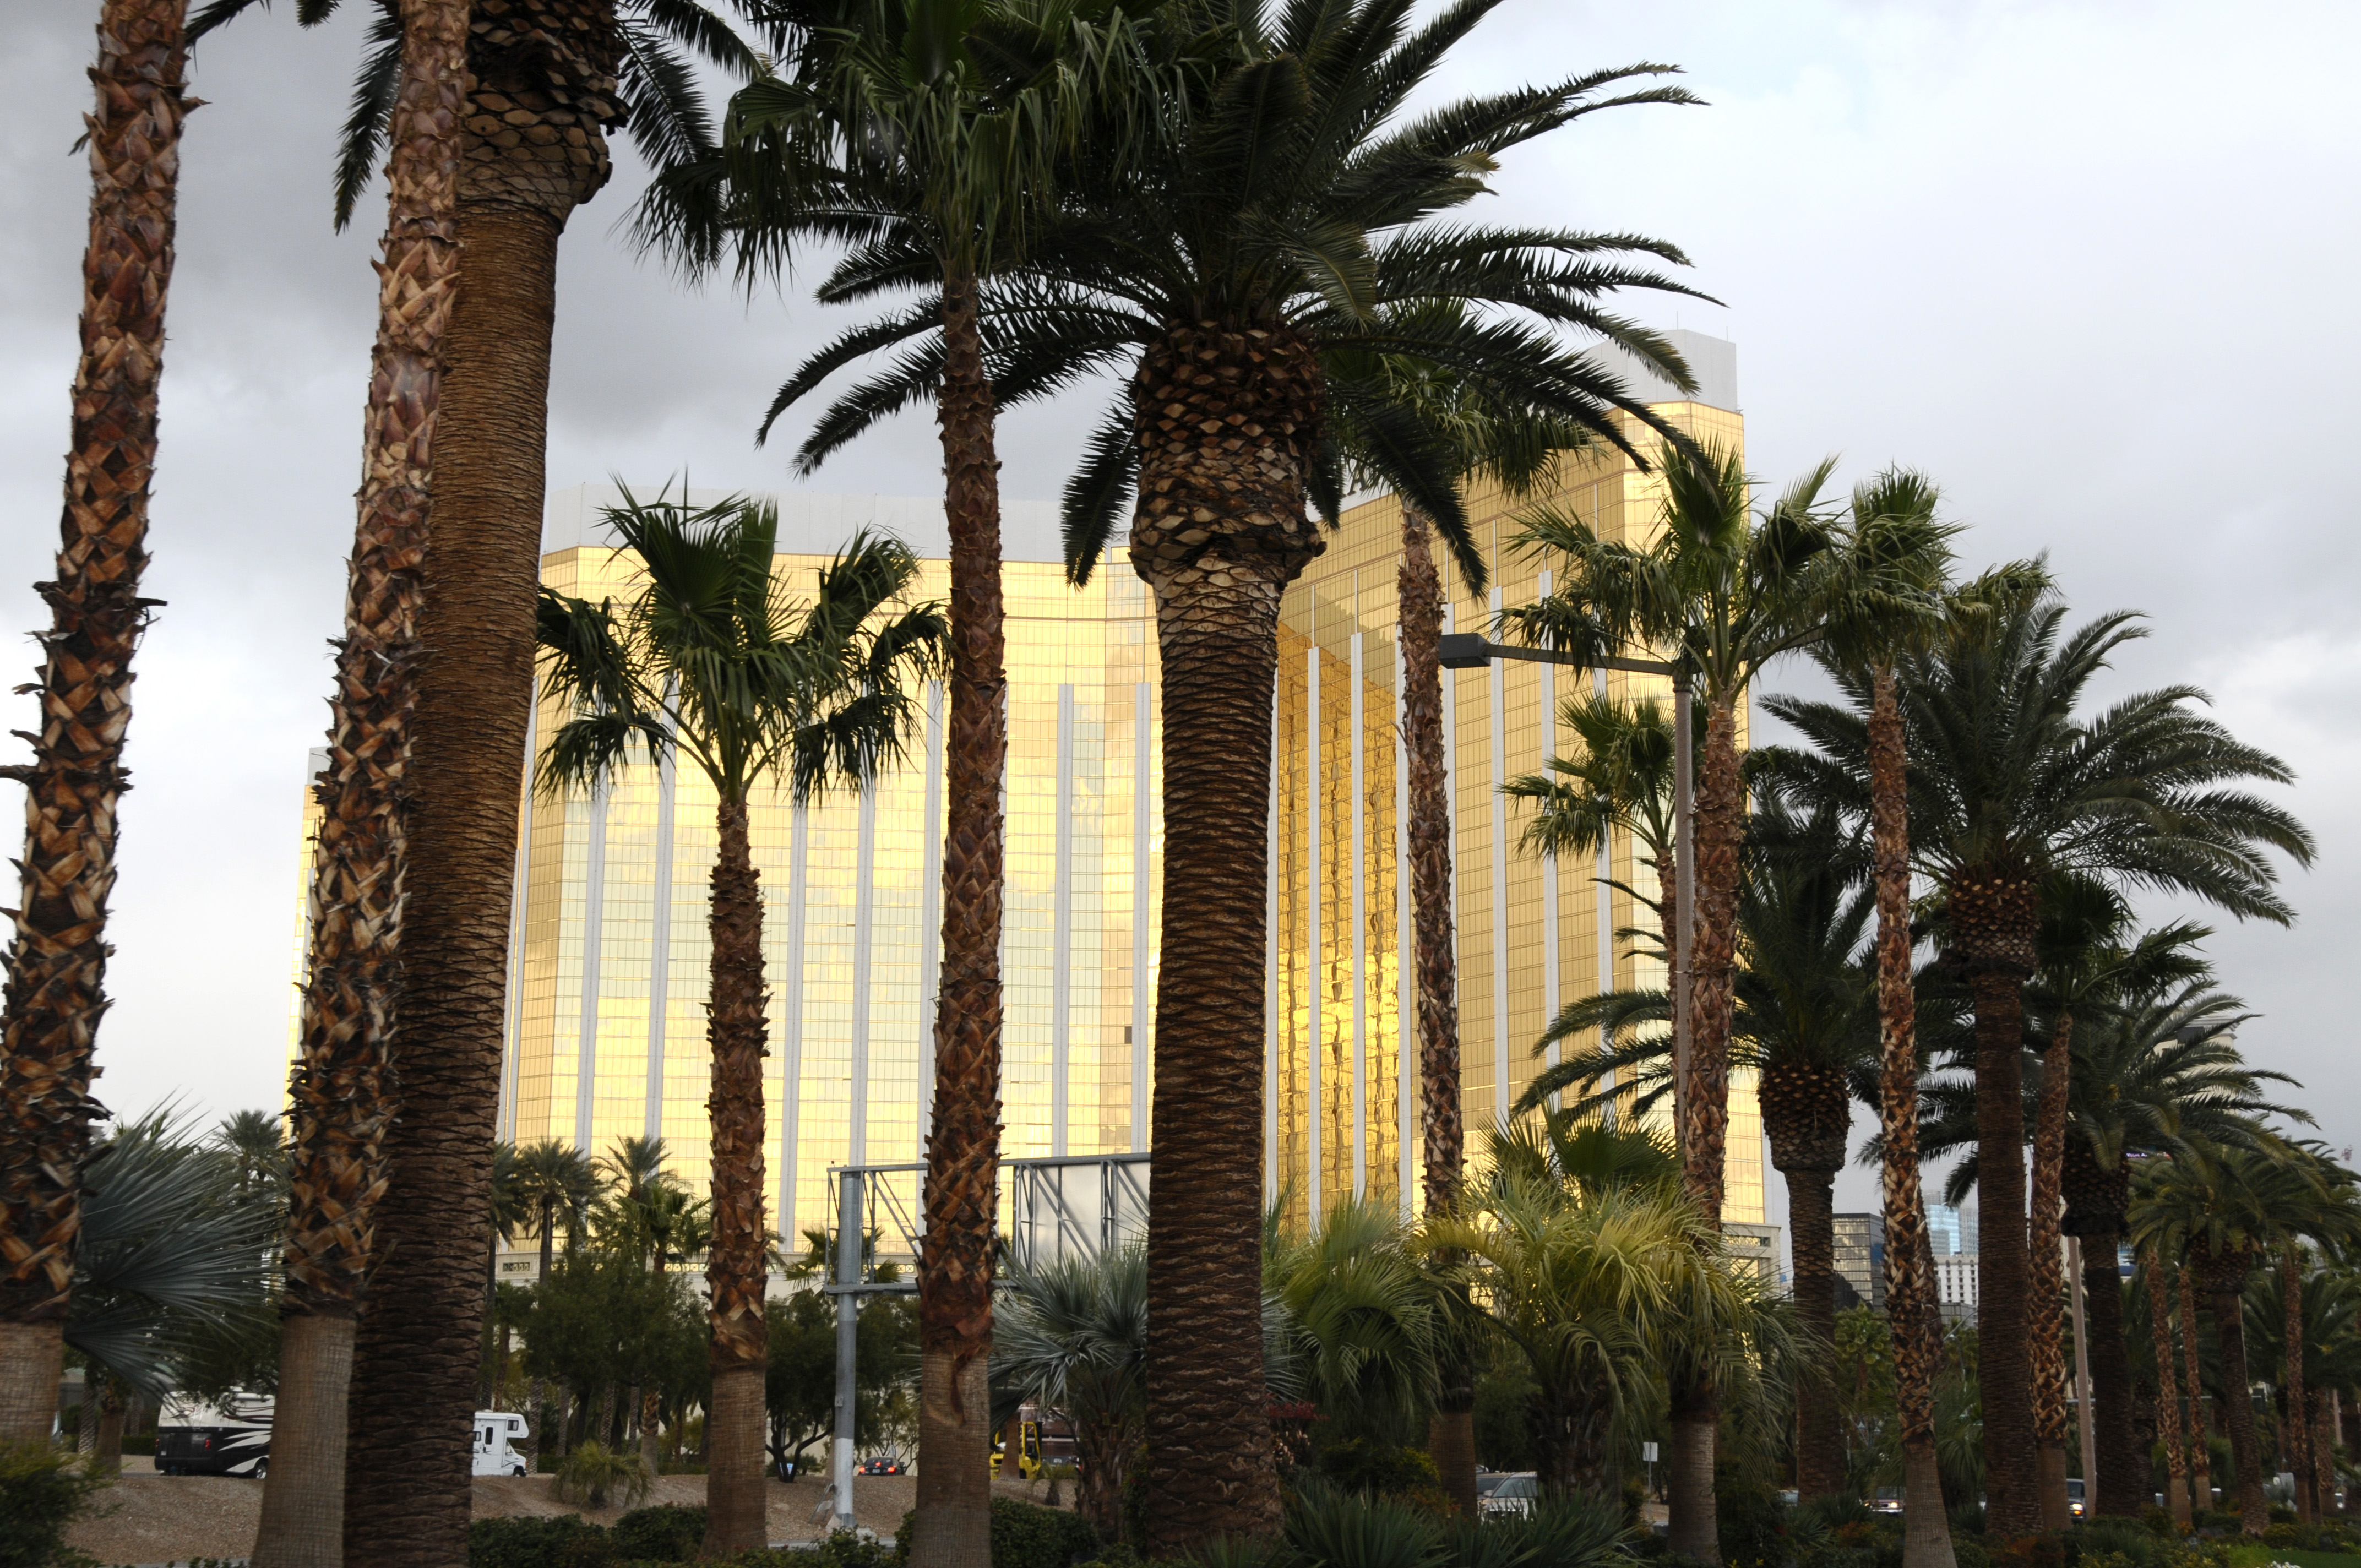 file mandalay bay behind palm trees 3273738918 jpg wikimedia commons